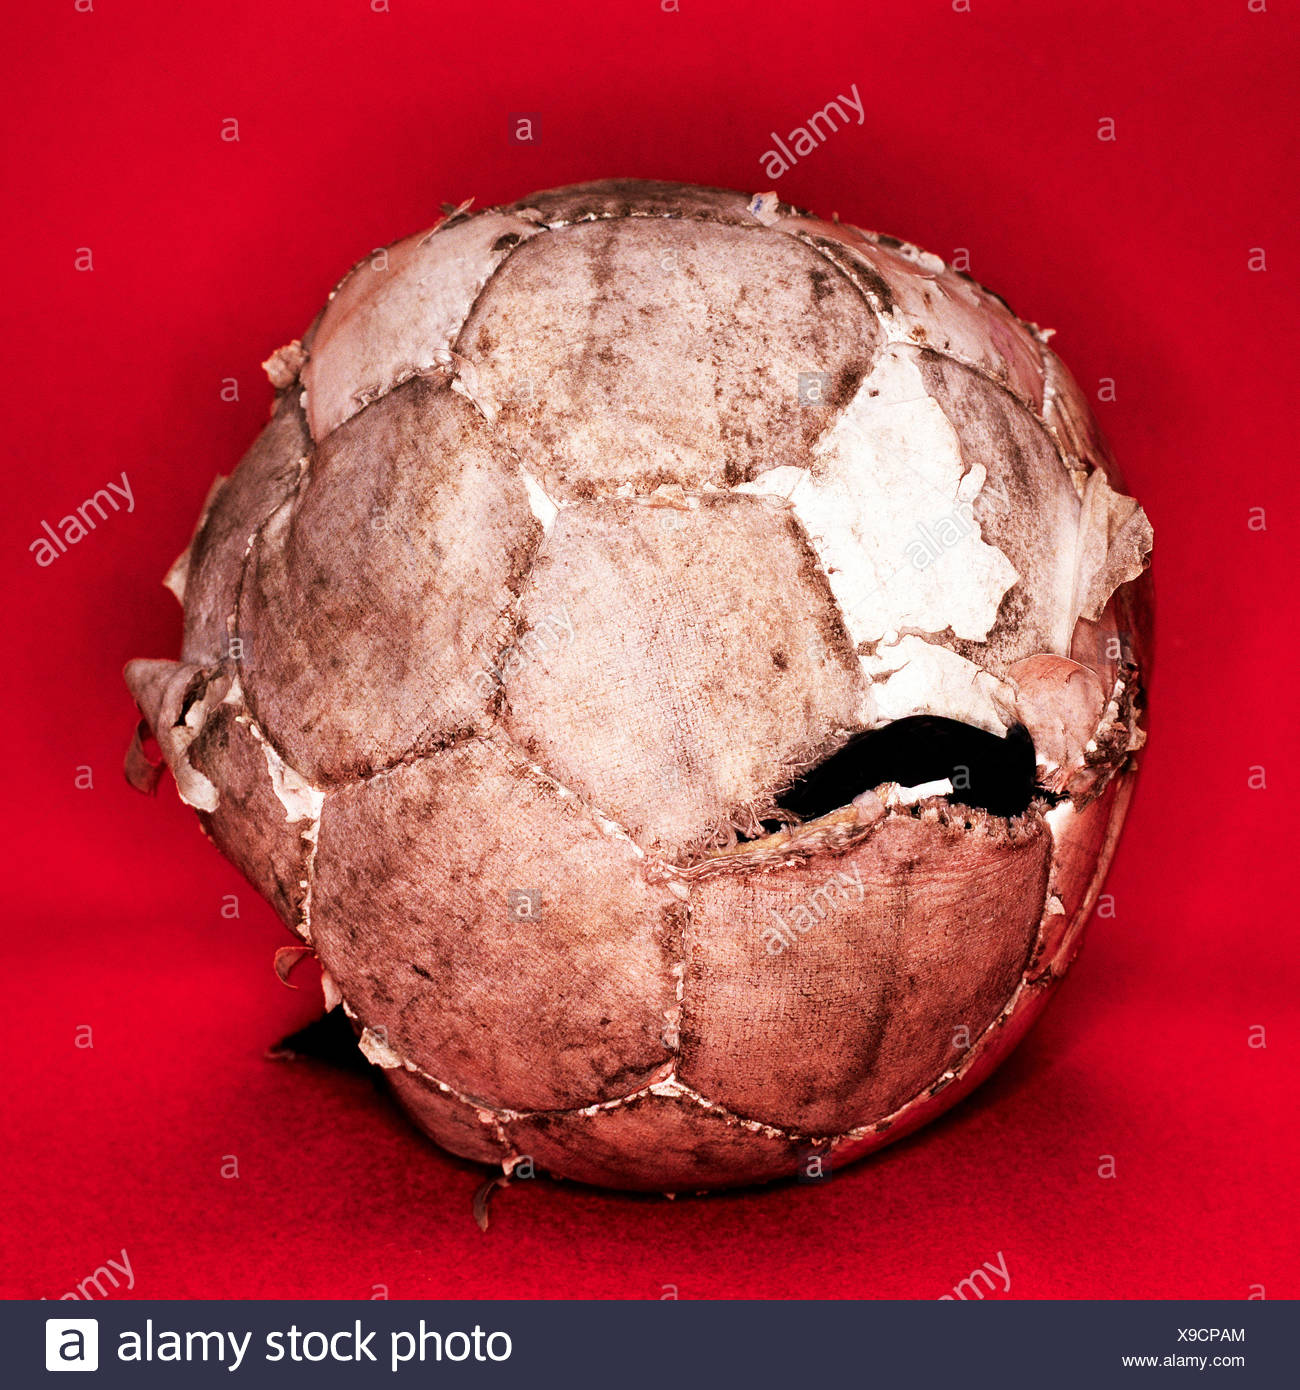 Football usés Photo Stock